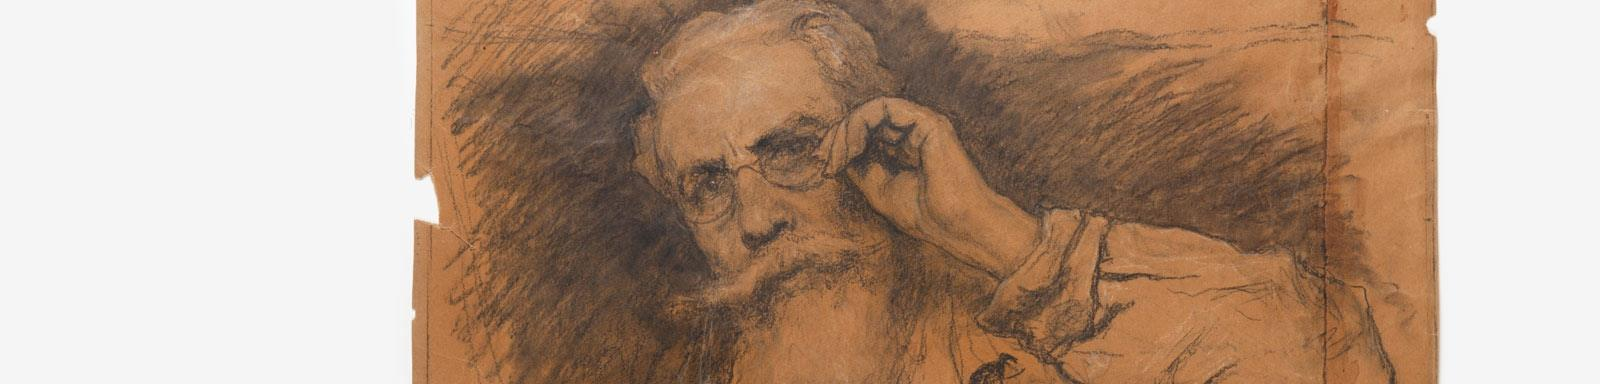 Jiménez Aranda, José